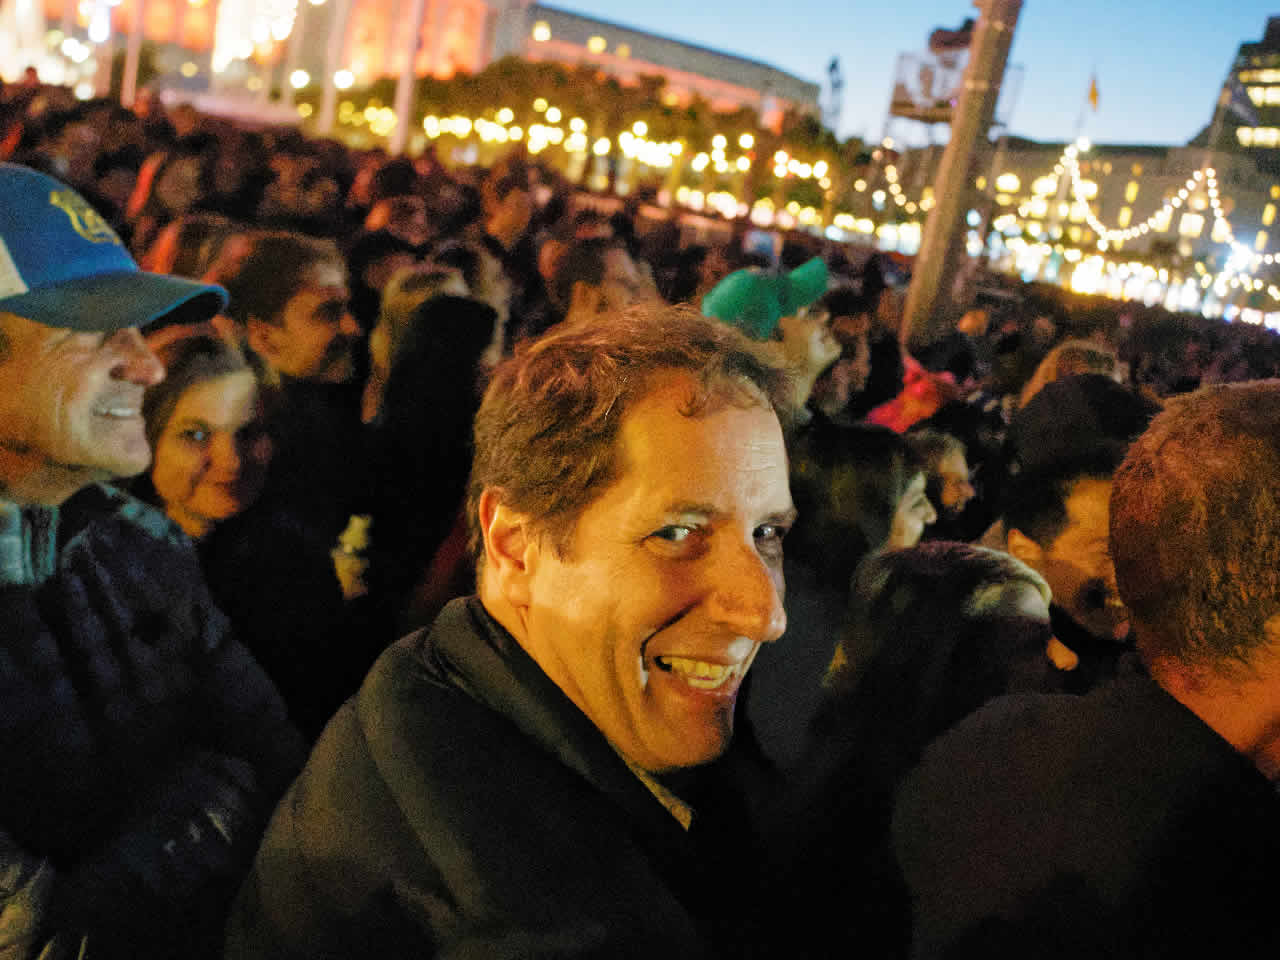 <div class='meta'><div class='origin-logo' data-origin='none'></div><span class='caption-text' data-credit='KGO-TV'>A man smiles during a music performance at Clusterfest in San Francisco, Calif. on June 1, 2018.</span></div>